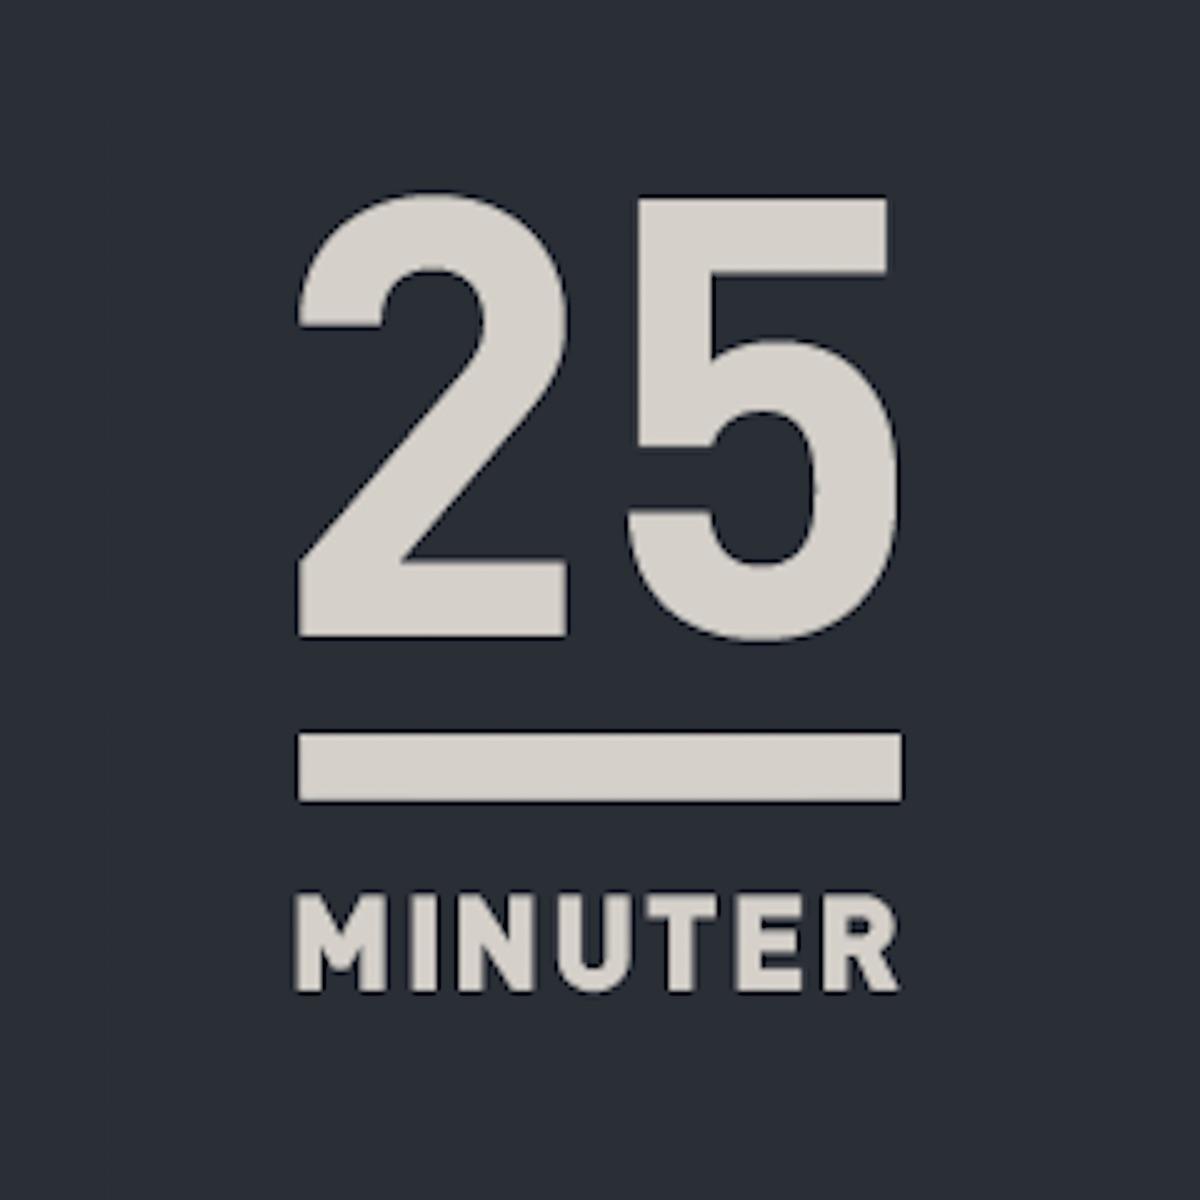 25 minuter